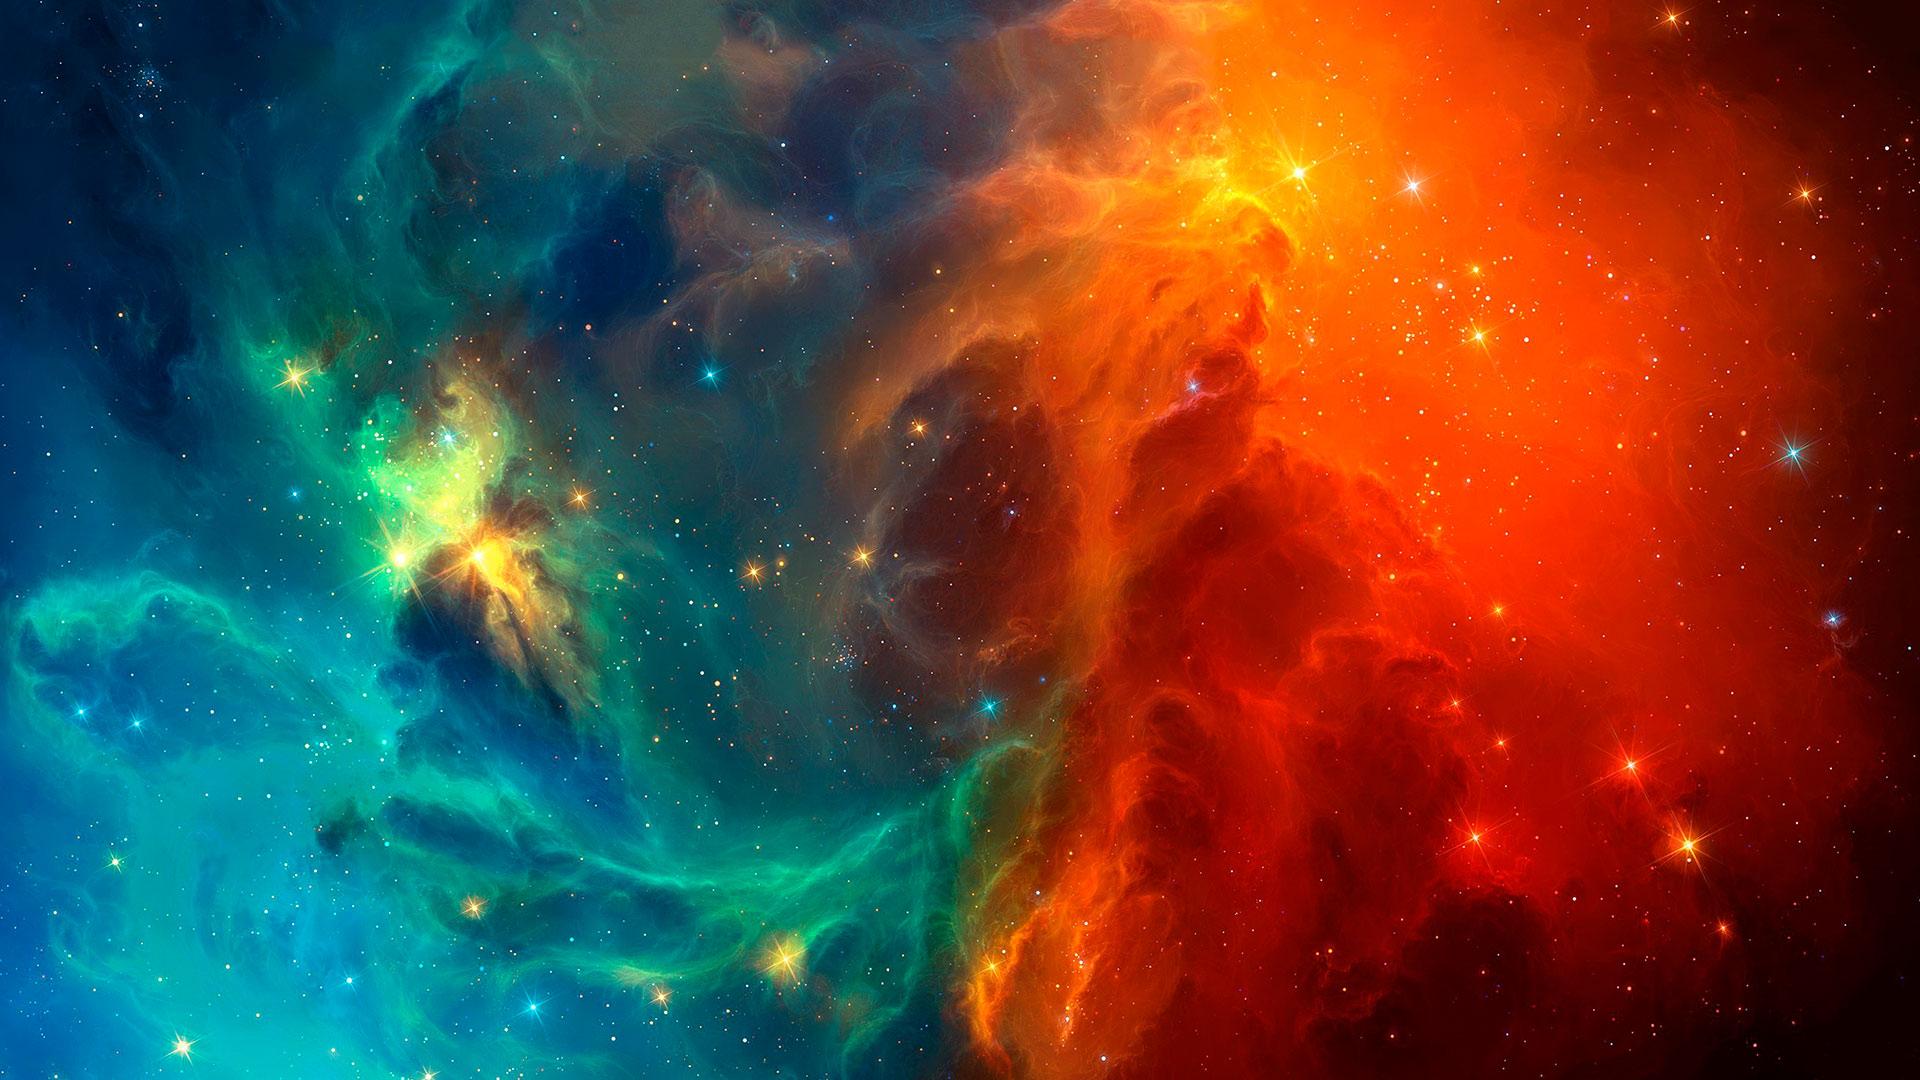 Steam Community Market Listings for 504400 Nebula Y Profile 1920x1080